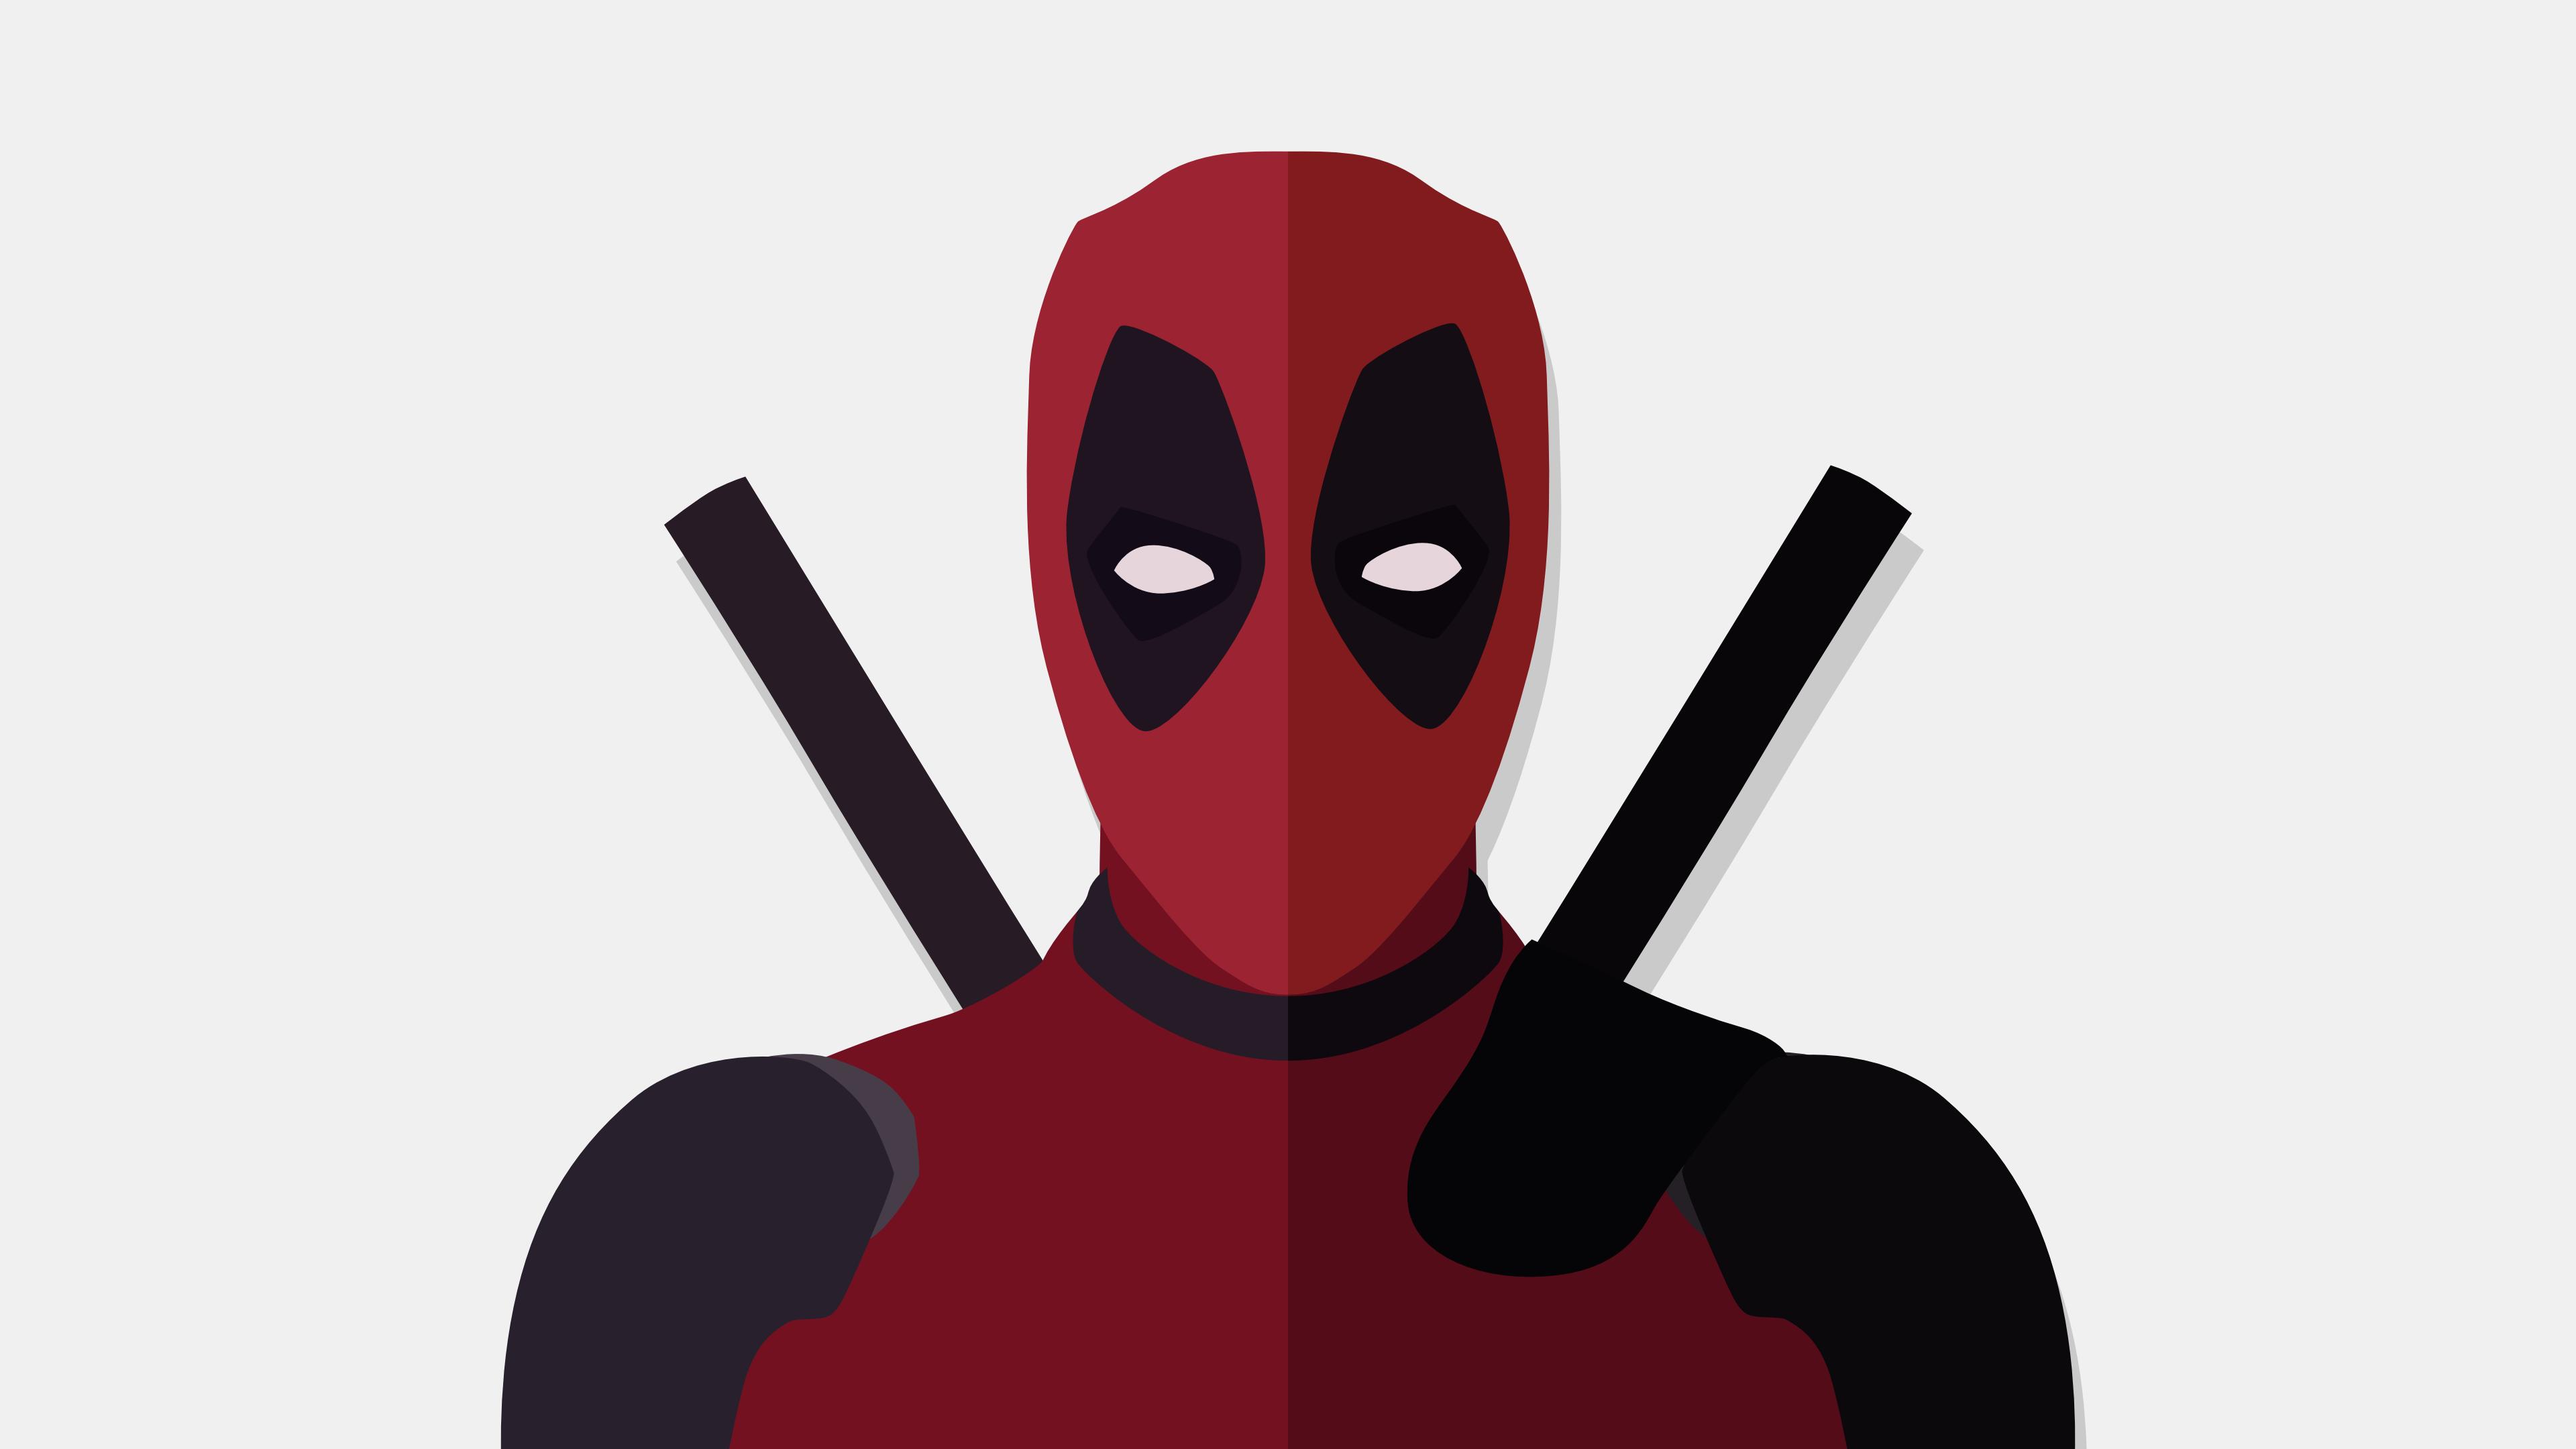 General 3840x2160 Flatdesign minimalism Deadpool DeviantArt vector graphics movies